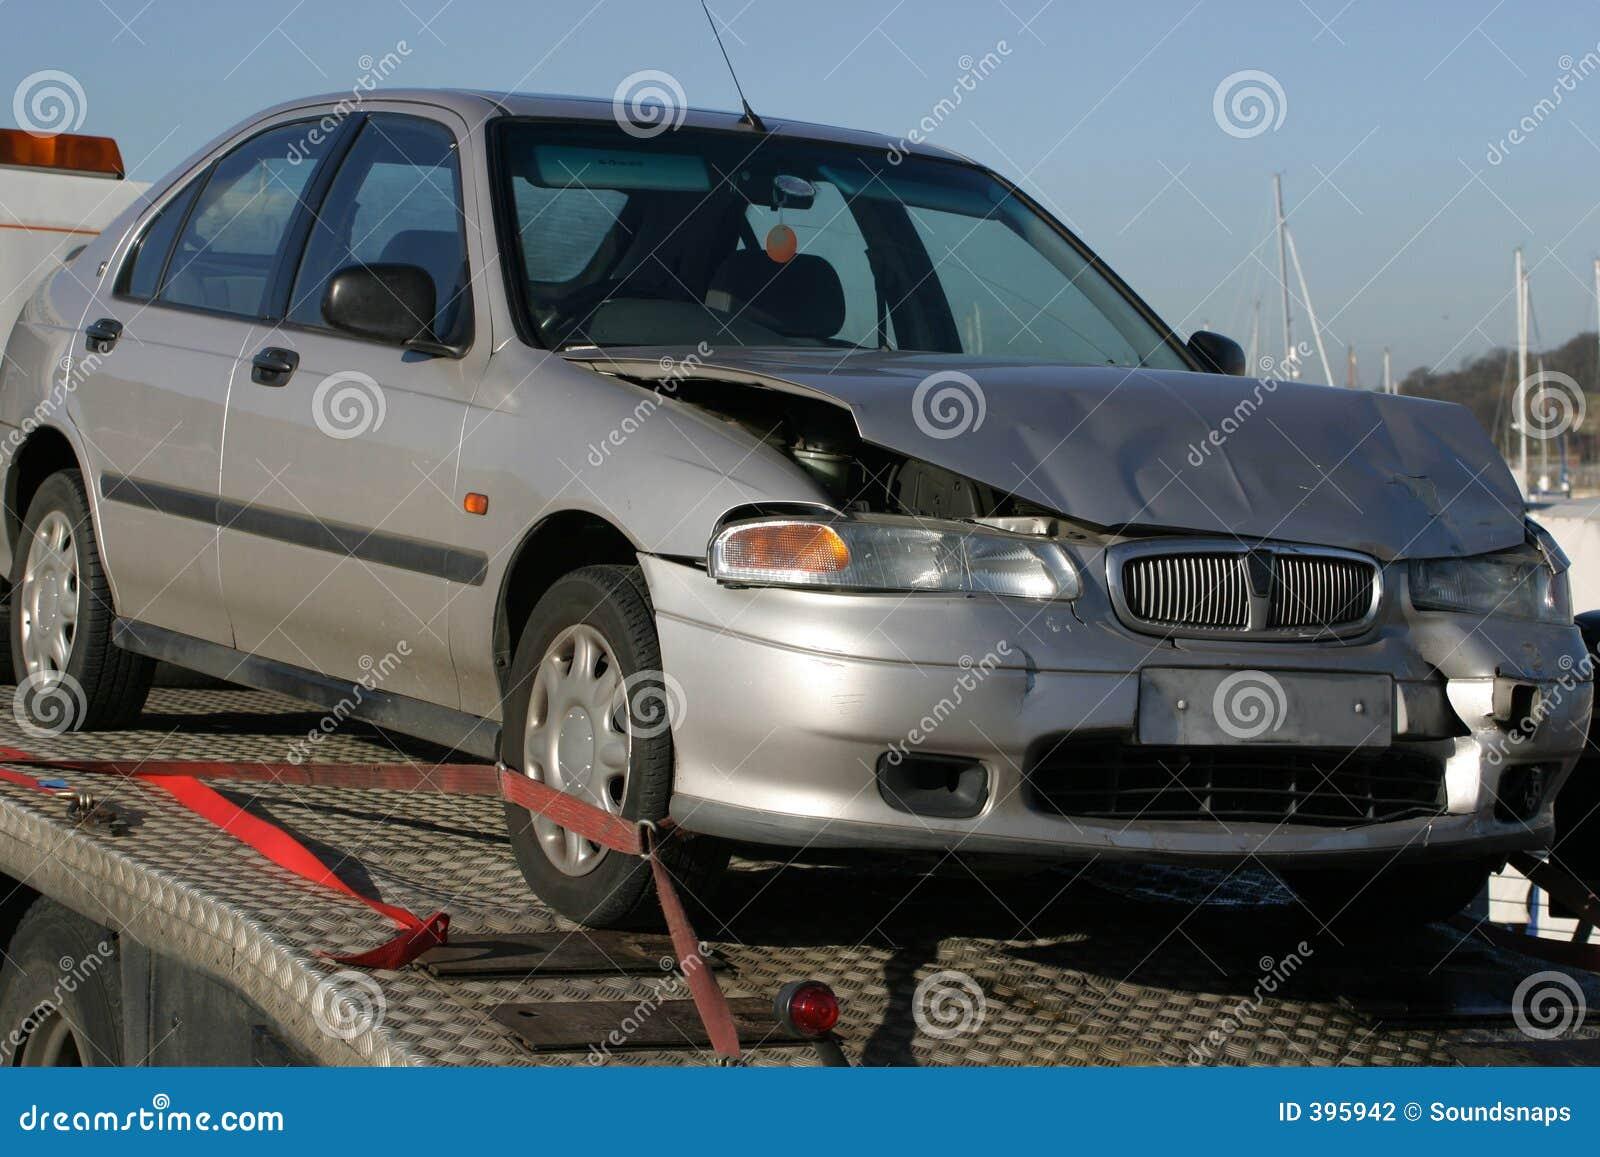 Car crash trailer